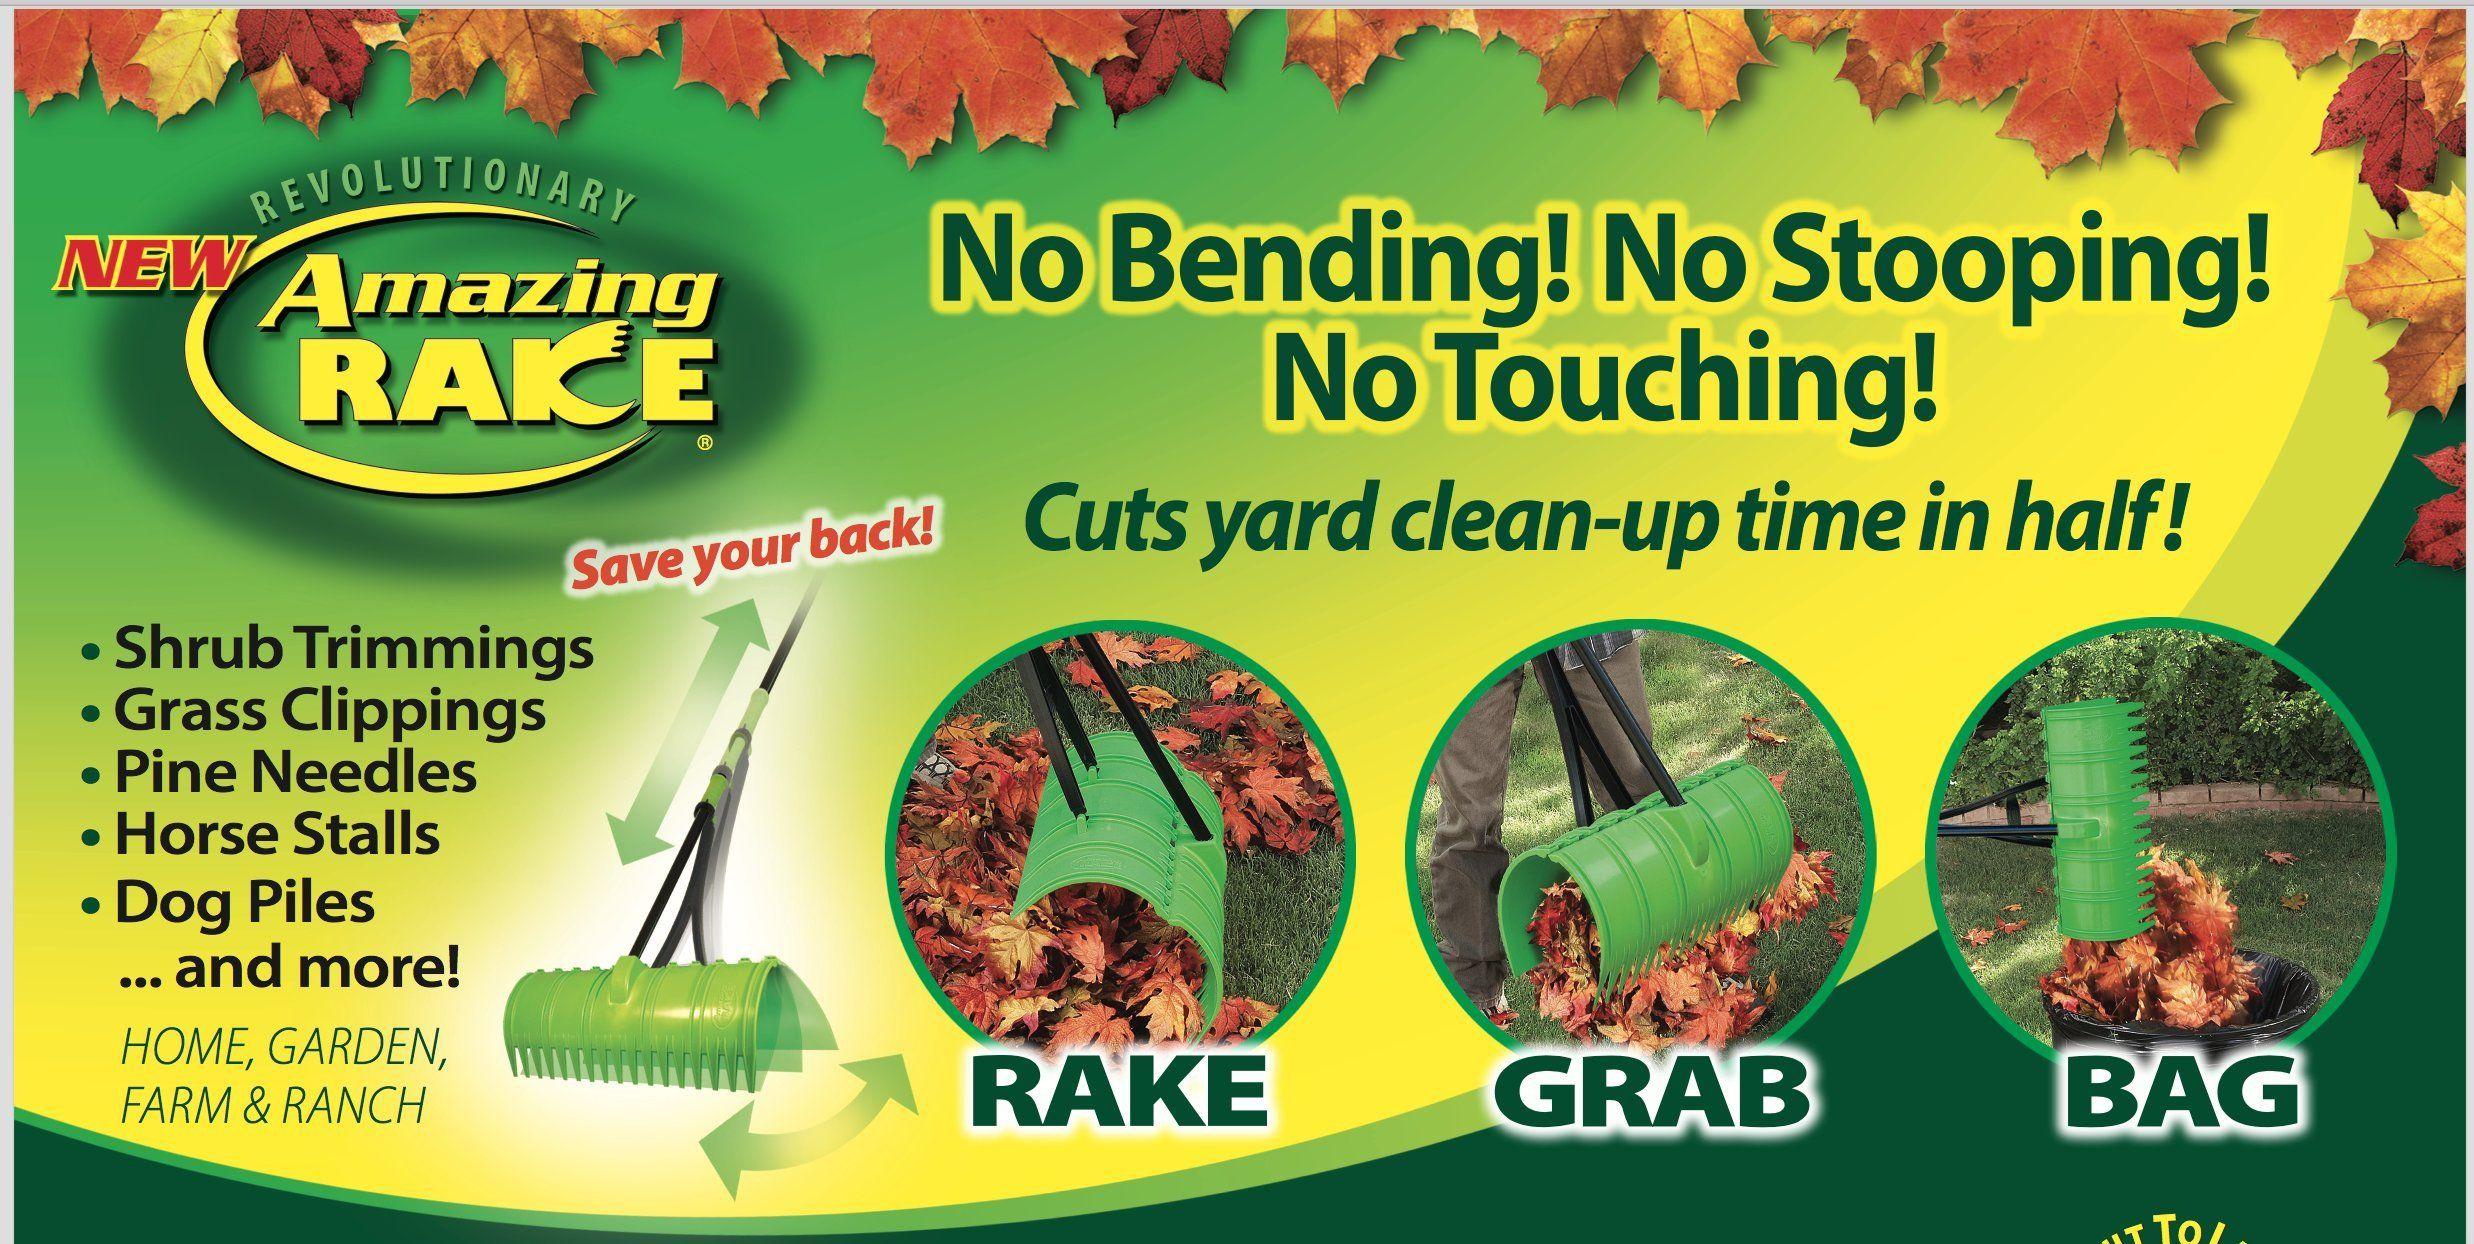 Amazing Rake 3in1 Yellow Ergonomic Lightweight 17inch Lawn Leaf Grabber Claw Yard Garden Pickup Tool For Leaves Grass Pine Pine Needles Outdoor Gardens Grass